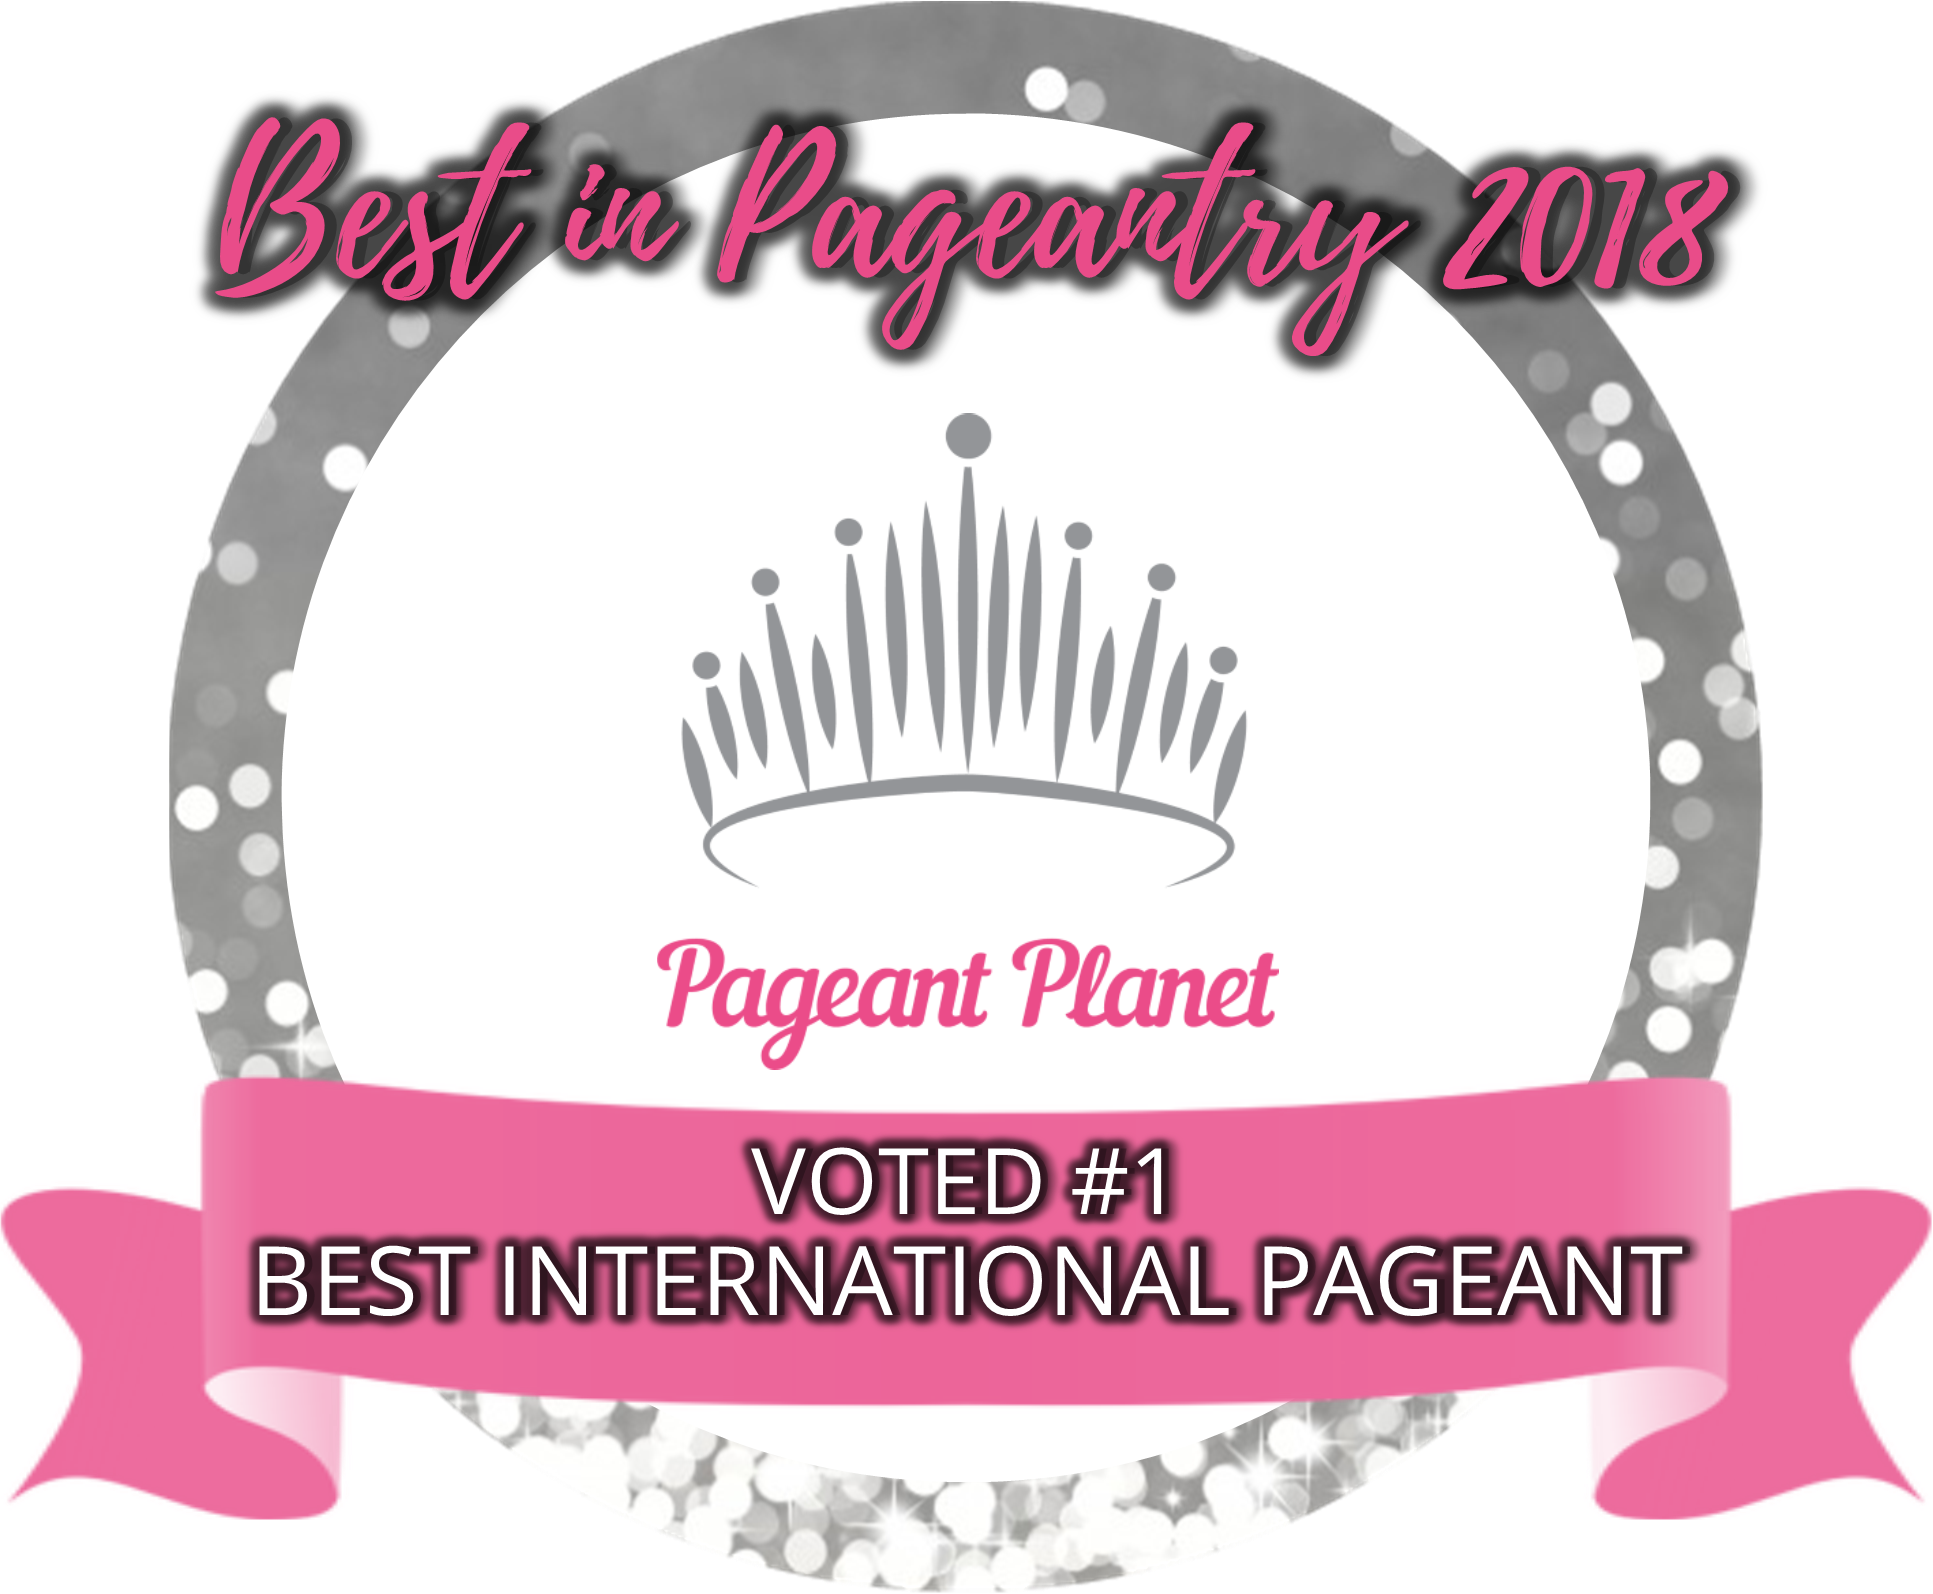 #1 Best International Pageant of 2018